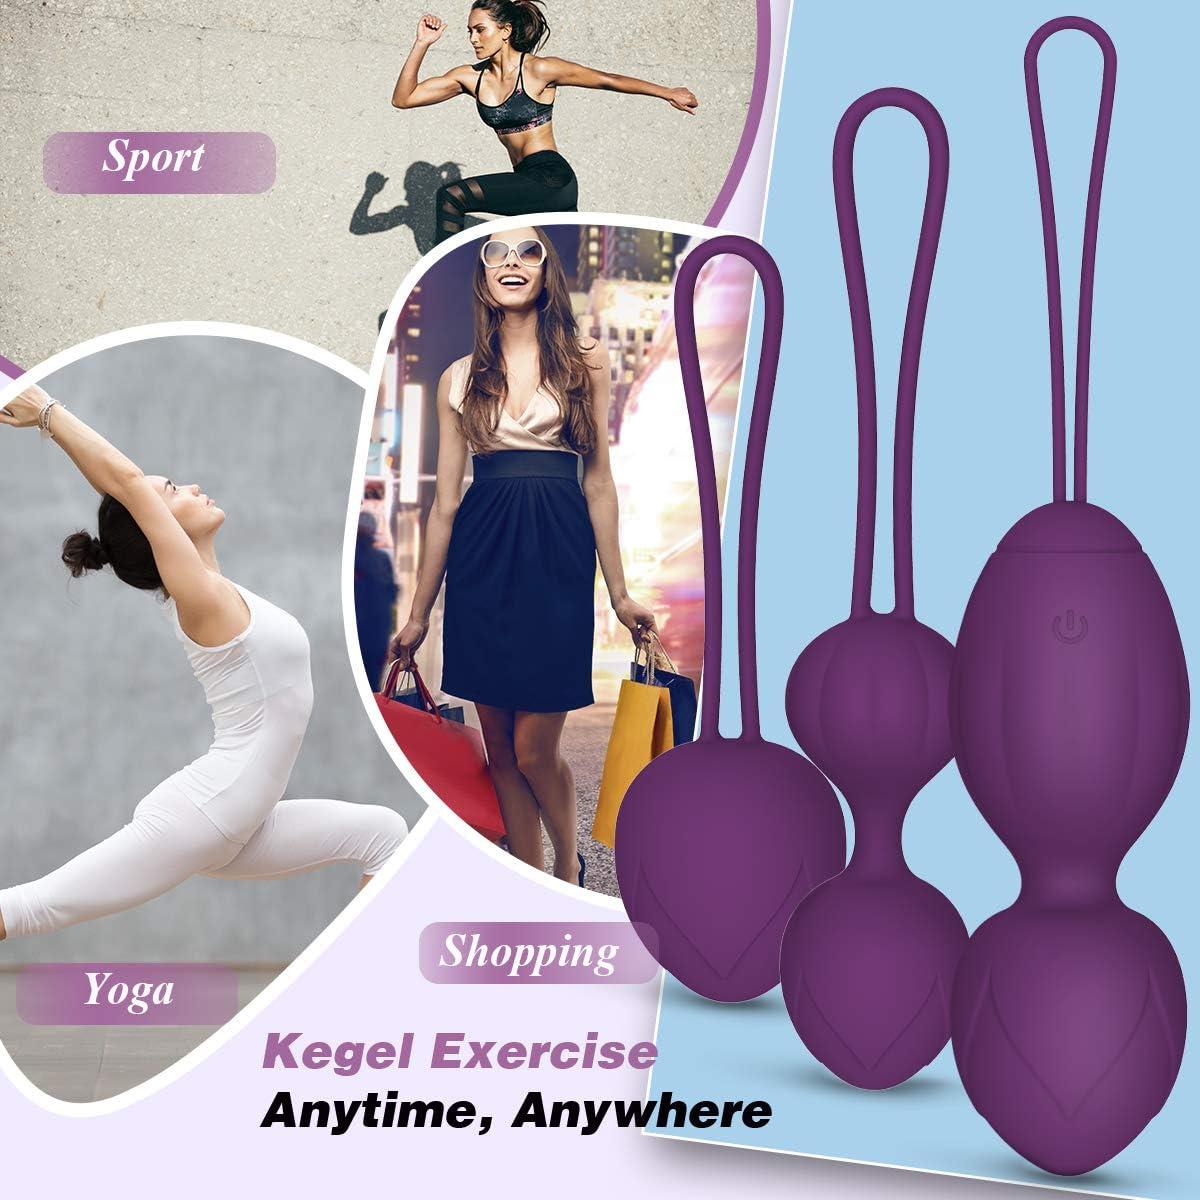 Kegel Balls for Tightening, Ben Wa Balls for Women Pelvic Floor Strengthening Device and Bladder Control Exerciser (Purple, 3 Balls): Health & Personal Care